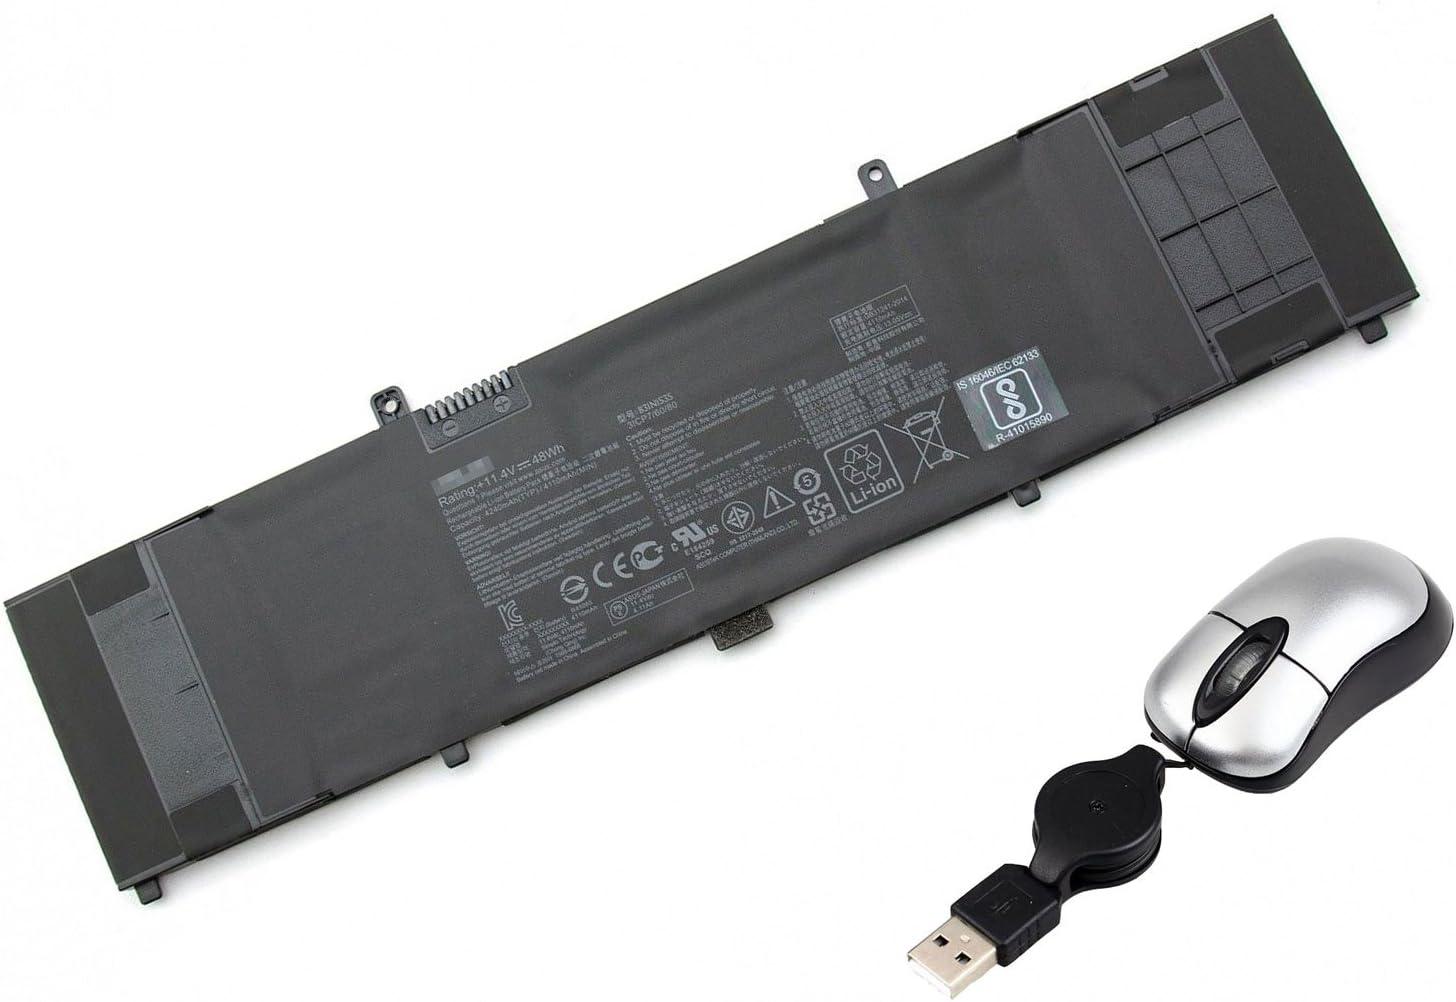 Replacement Battery for Dell 93FTF, Dell Latitude E5280, E5480, 83XPC, D4CMT - Includes Mini Optical Mouse